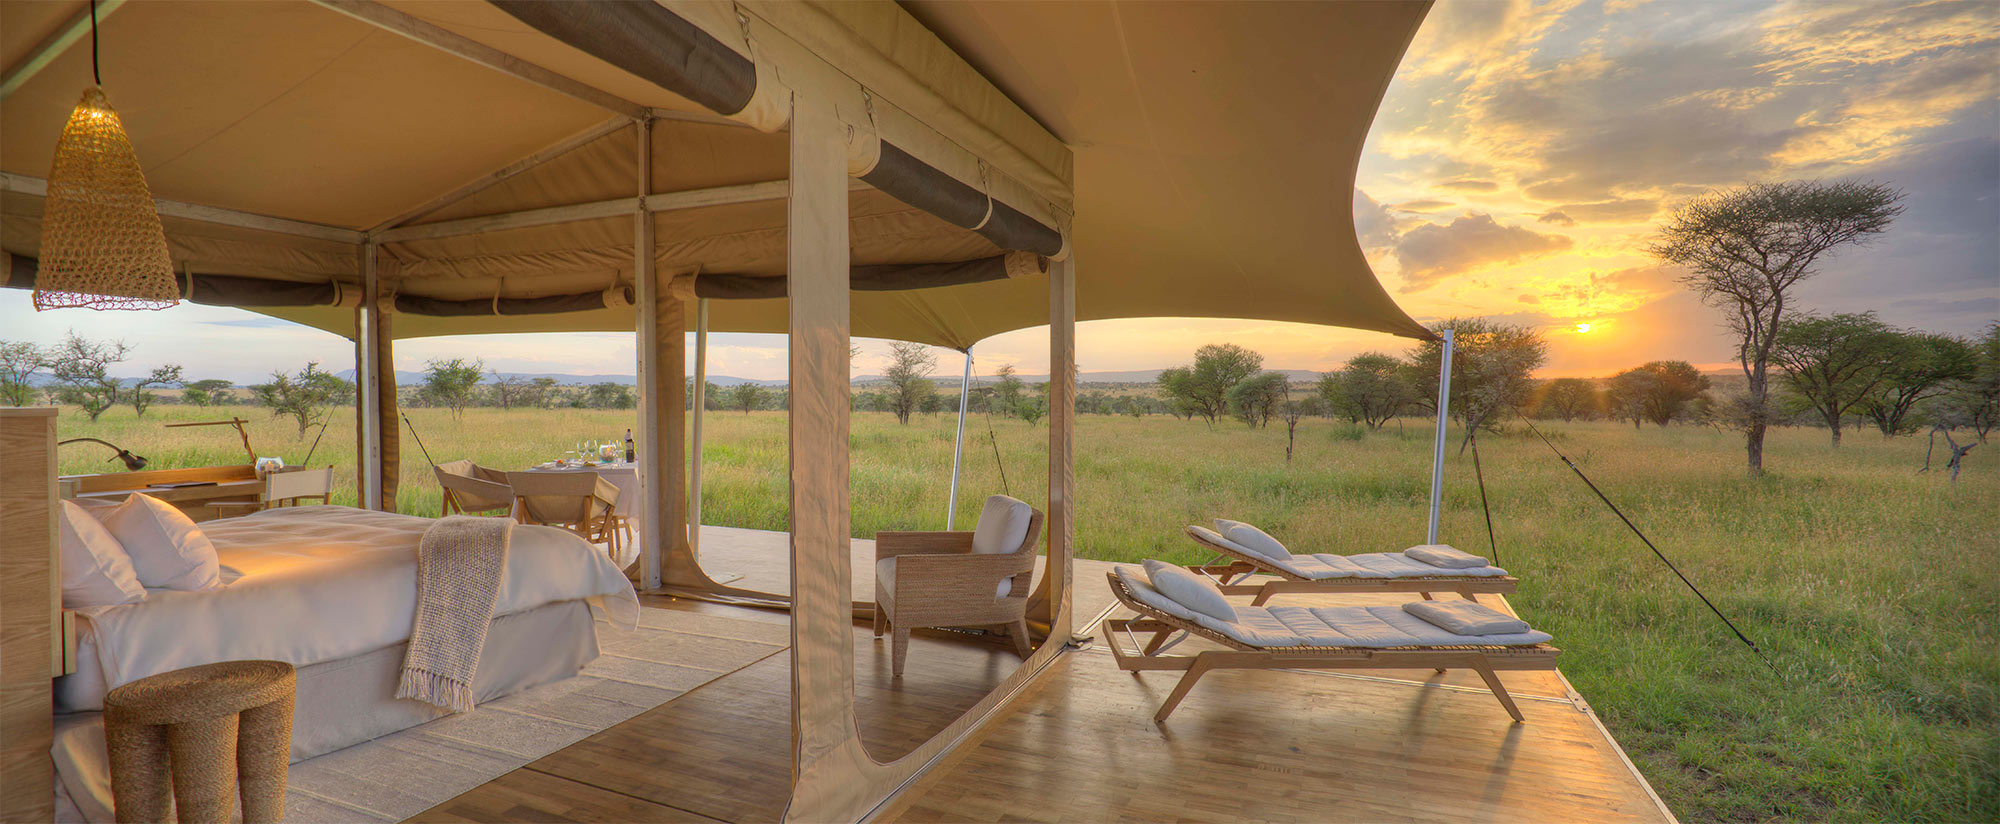 Luxury Safari accommodation